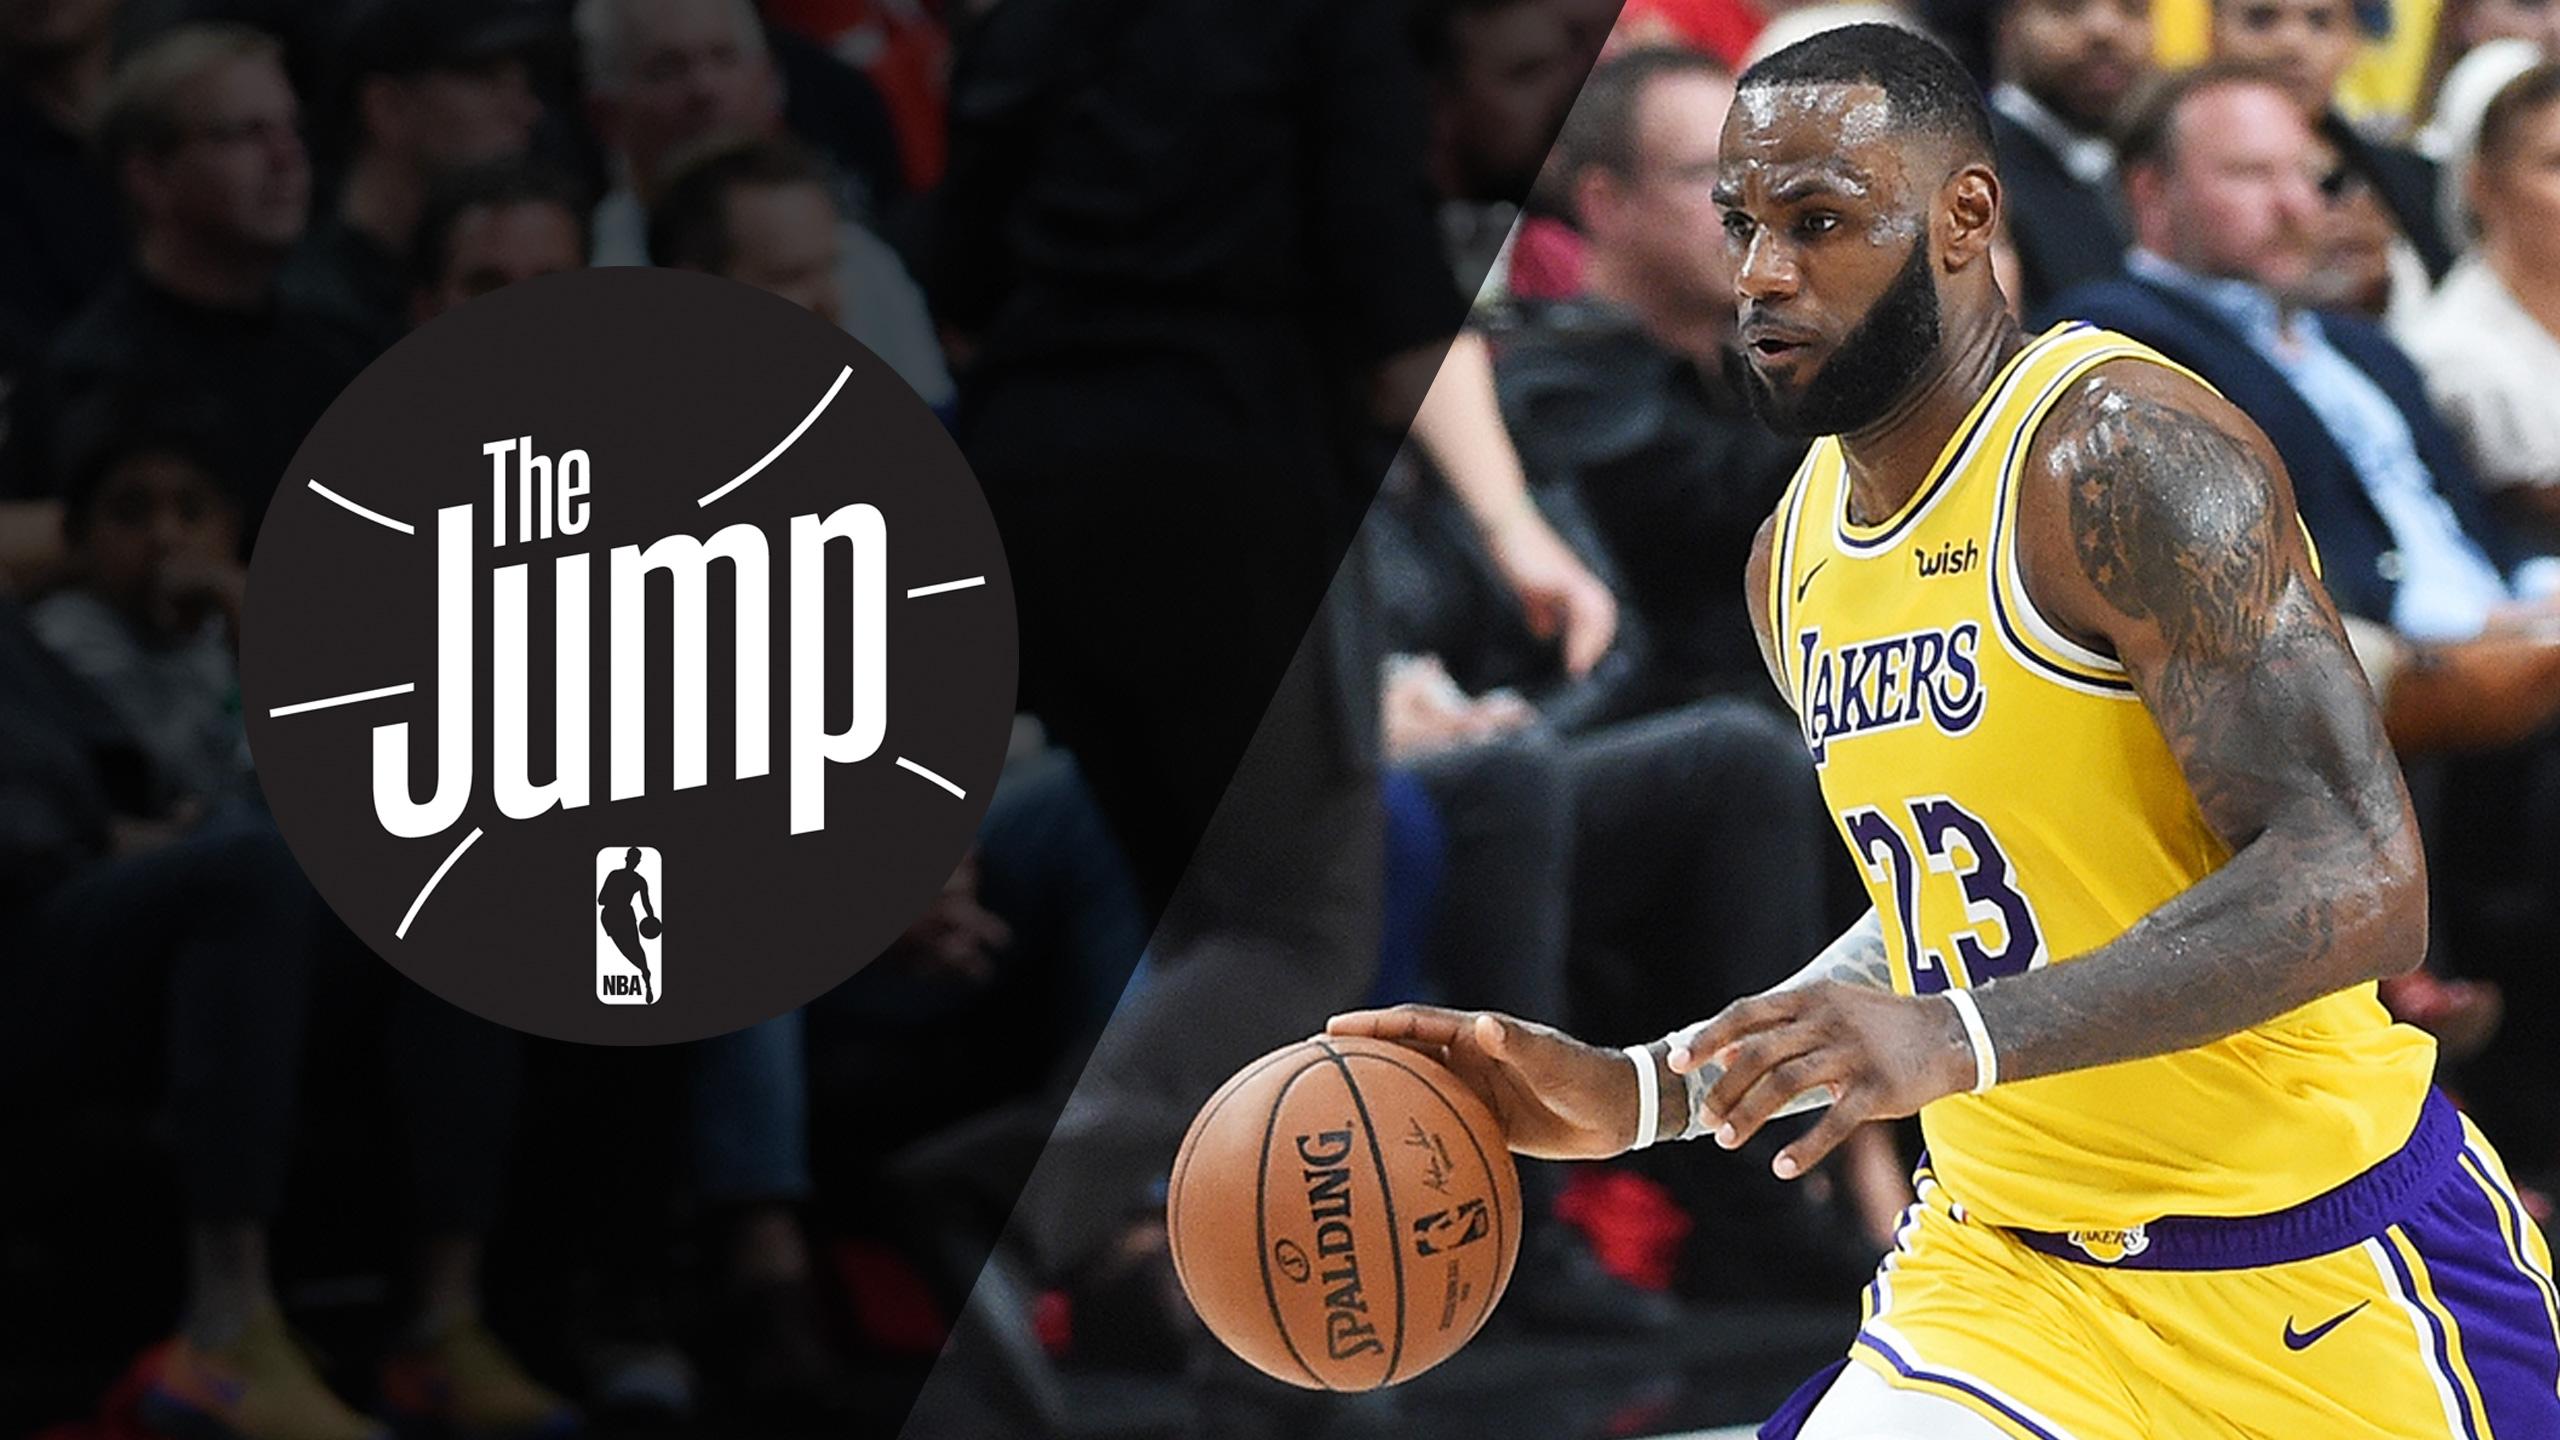 NBA: The Jump Presented by Marathon Petroleum